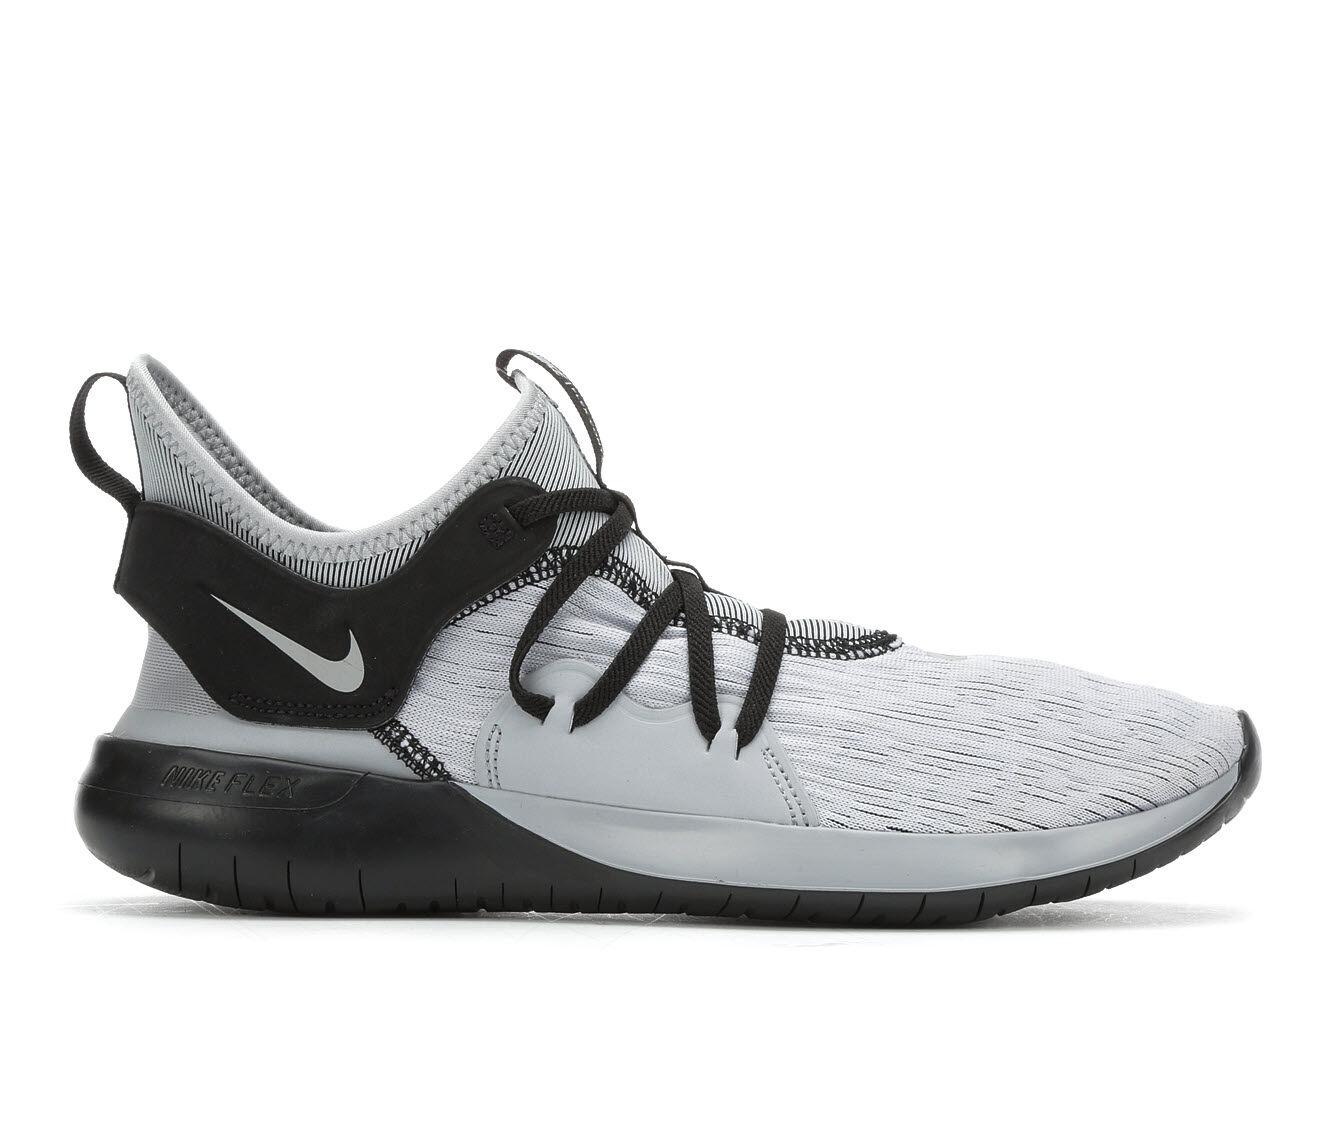 big savings on Men's Nike Flex Contact 3 Running Shoes Gry/Blk 003